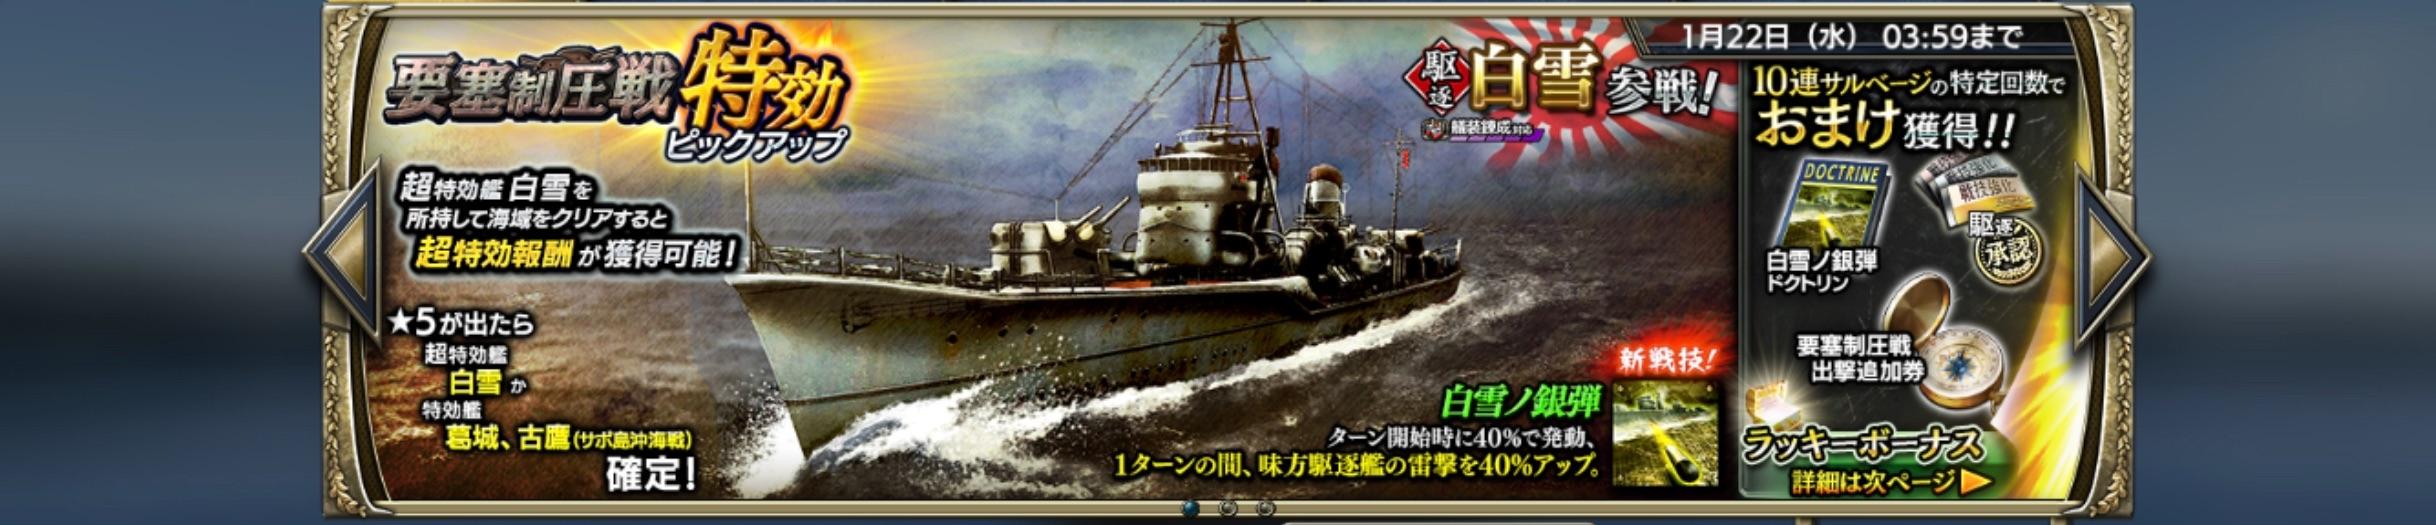 souen-destroyer:shirayuki